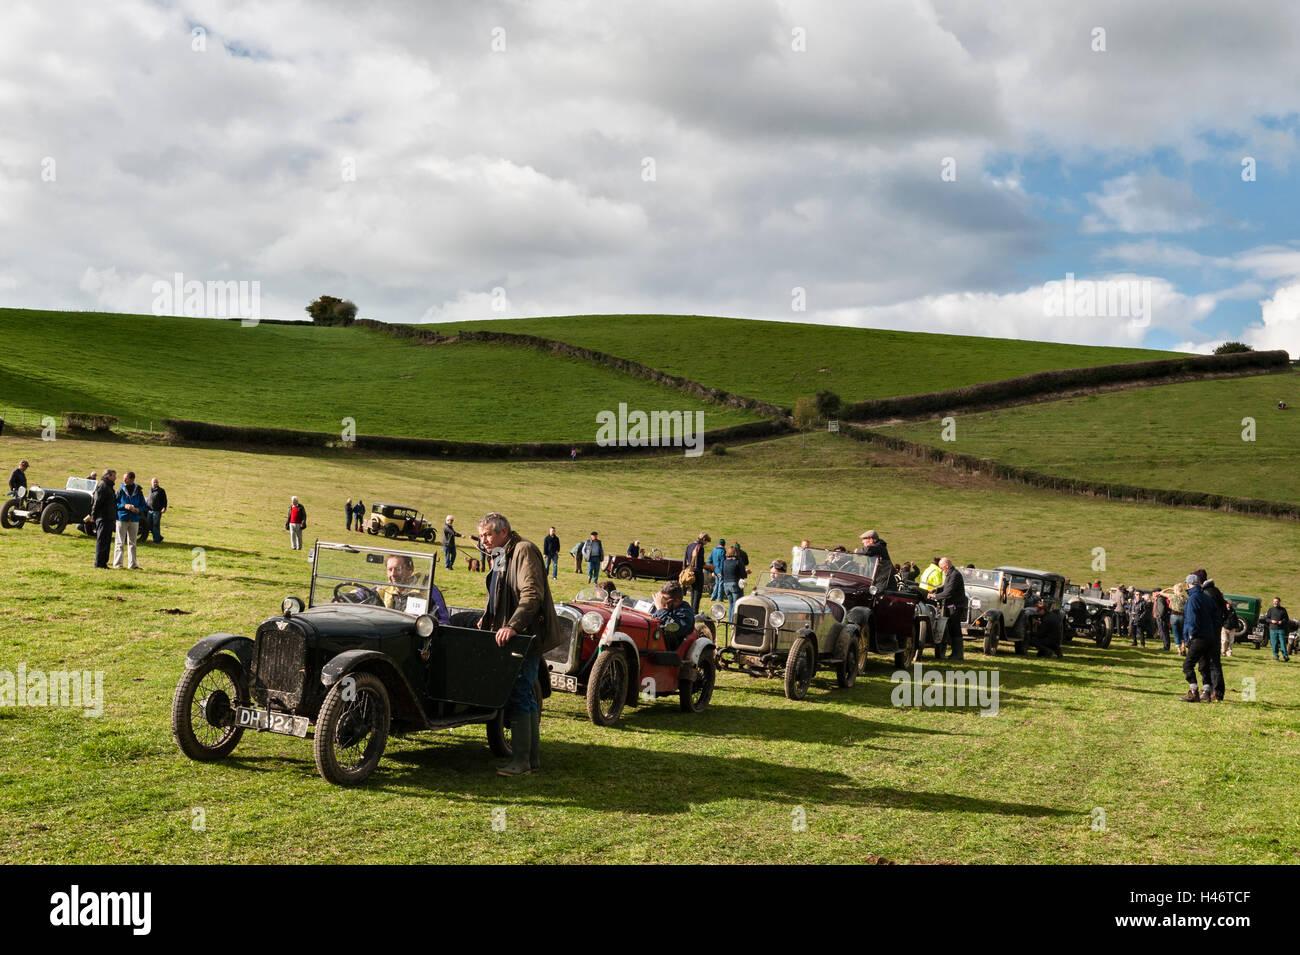 Cwm Whitton, near Knighton, Powys, UK. An annual rally of the VSCC (Vintage Sports-Car Club) has taken place here - Stock Image